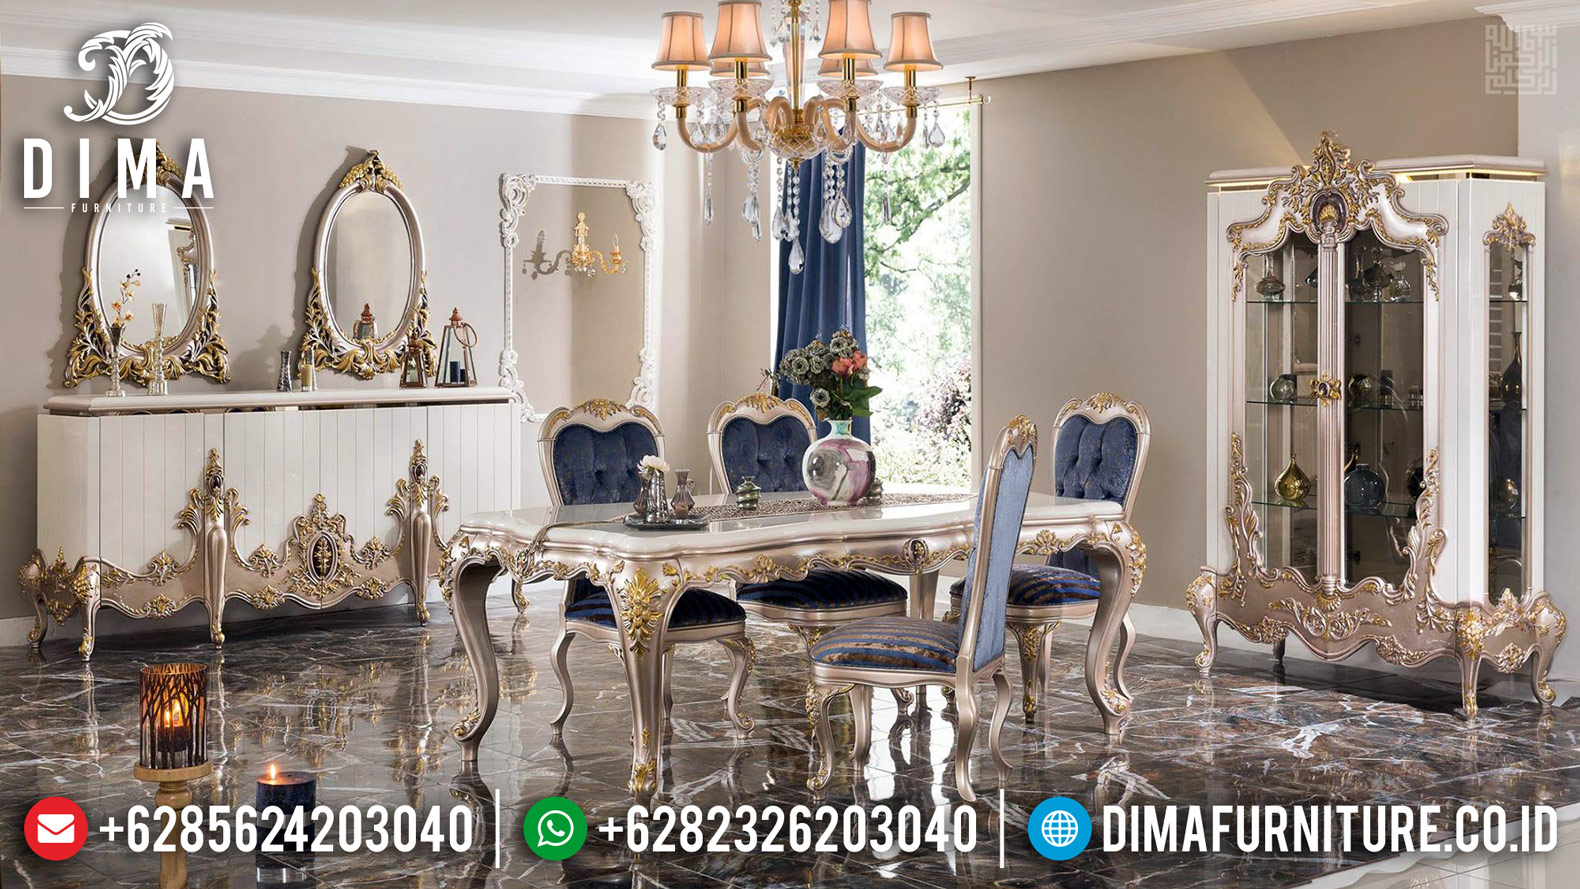 Meja Makan Mewah Elegan Superior Luxury White Duco Golden Combination BT-0375